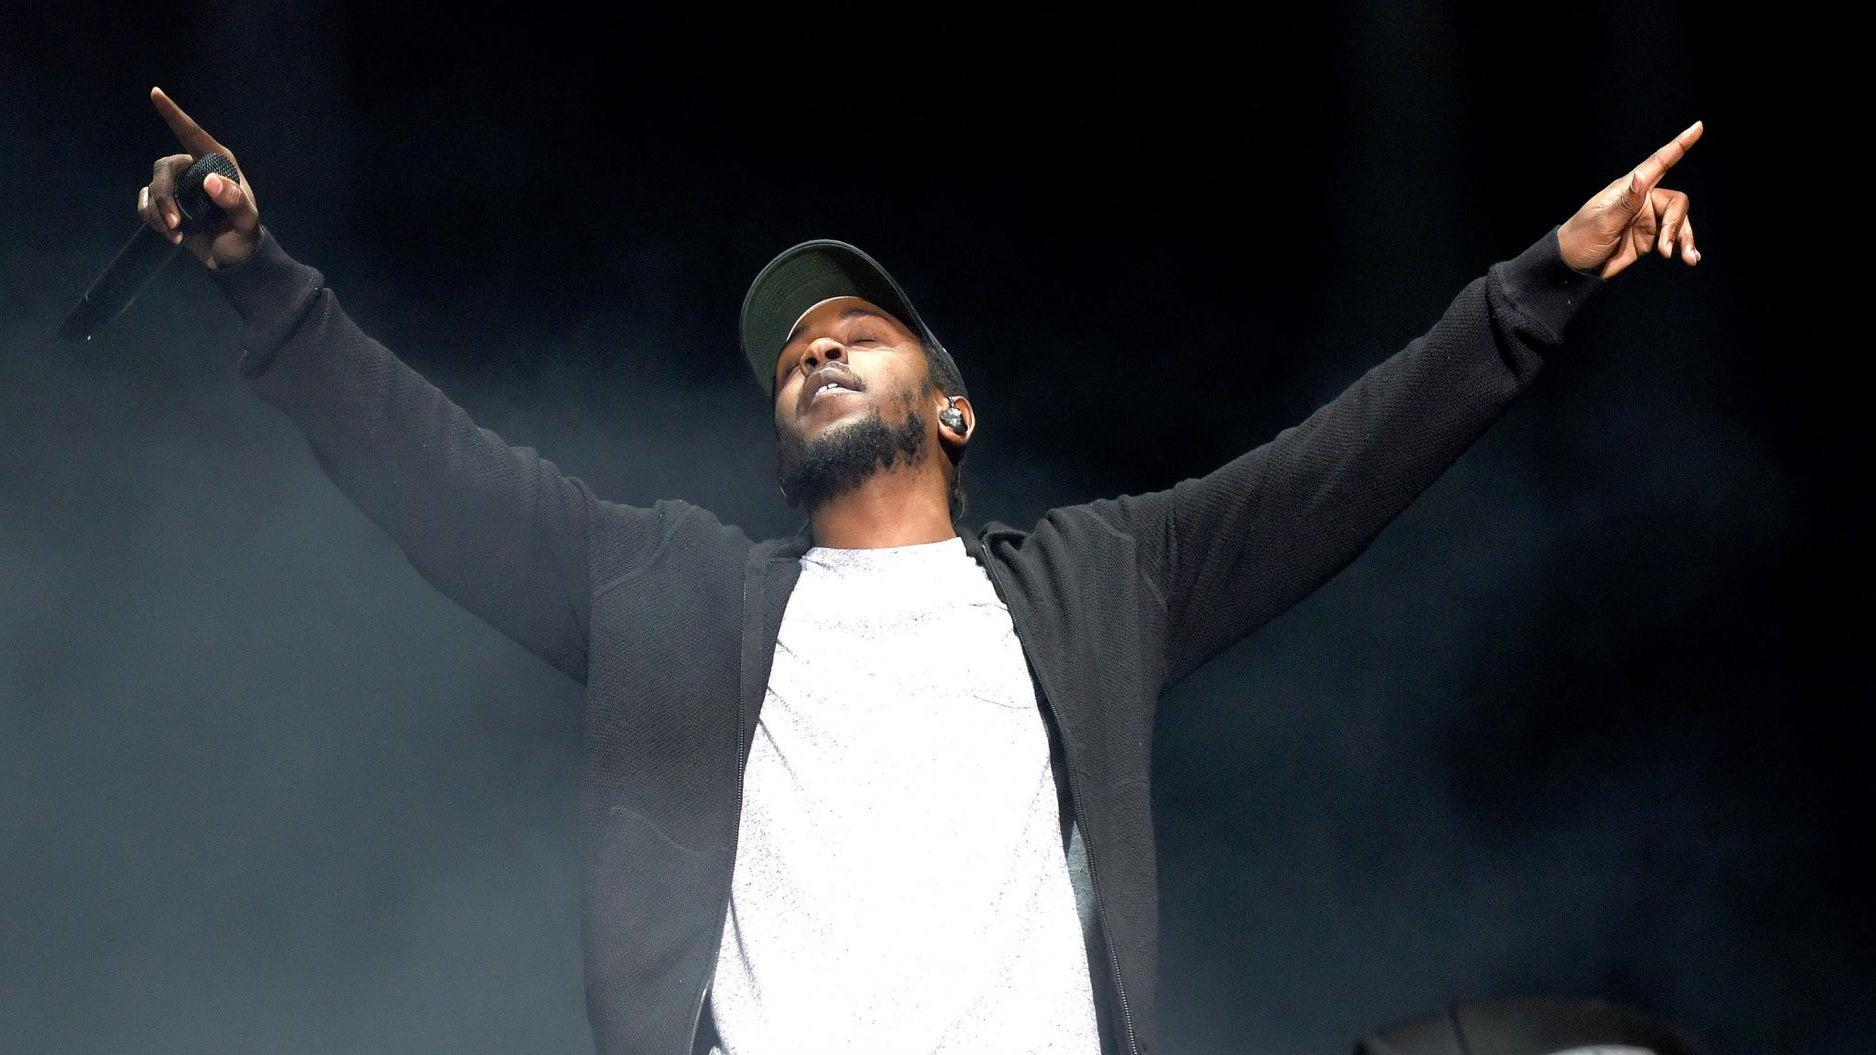 Kendrick Lamar Leads Grammy Nominations; Nicki Minaj, The Weeknd Also Earn Nods